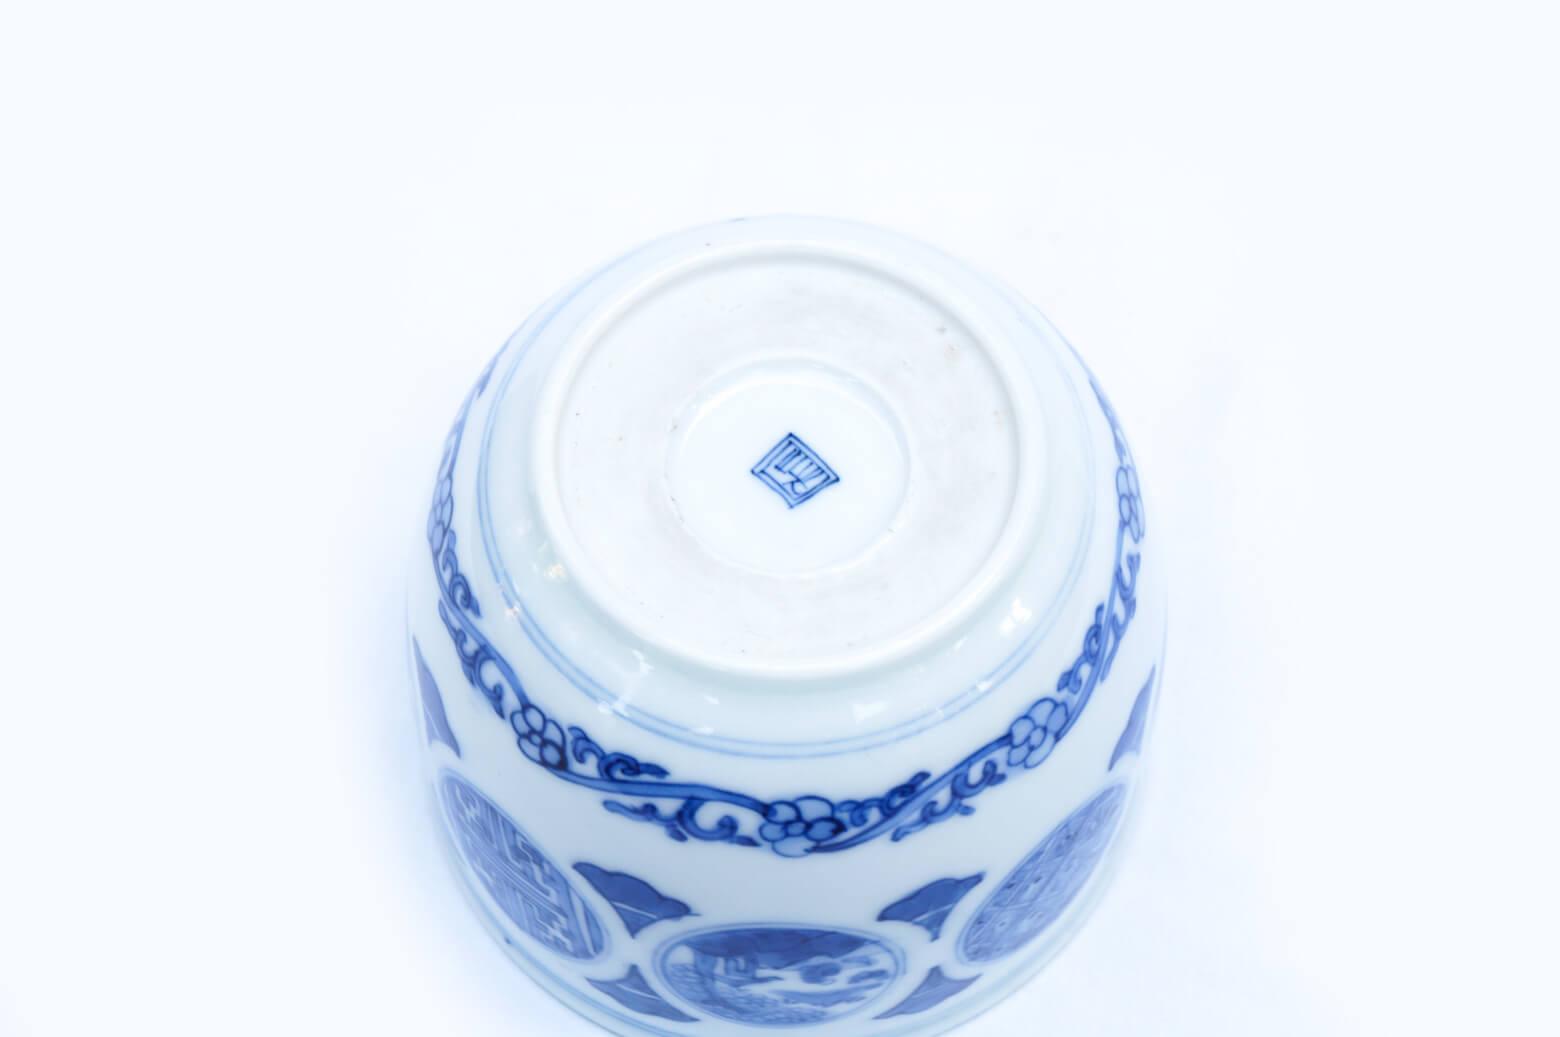 Japan Vintage Tabacco Tray/煙草盆 茶道具 古道具 お香立て 骨董